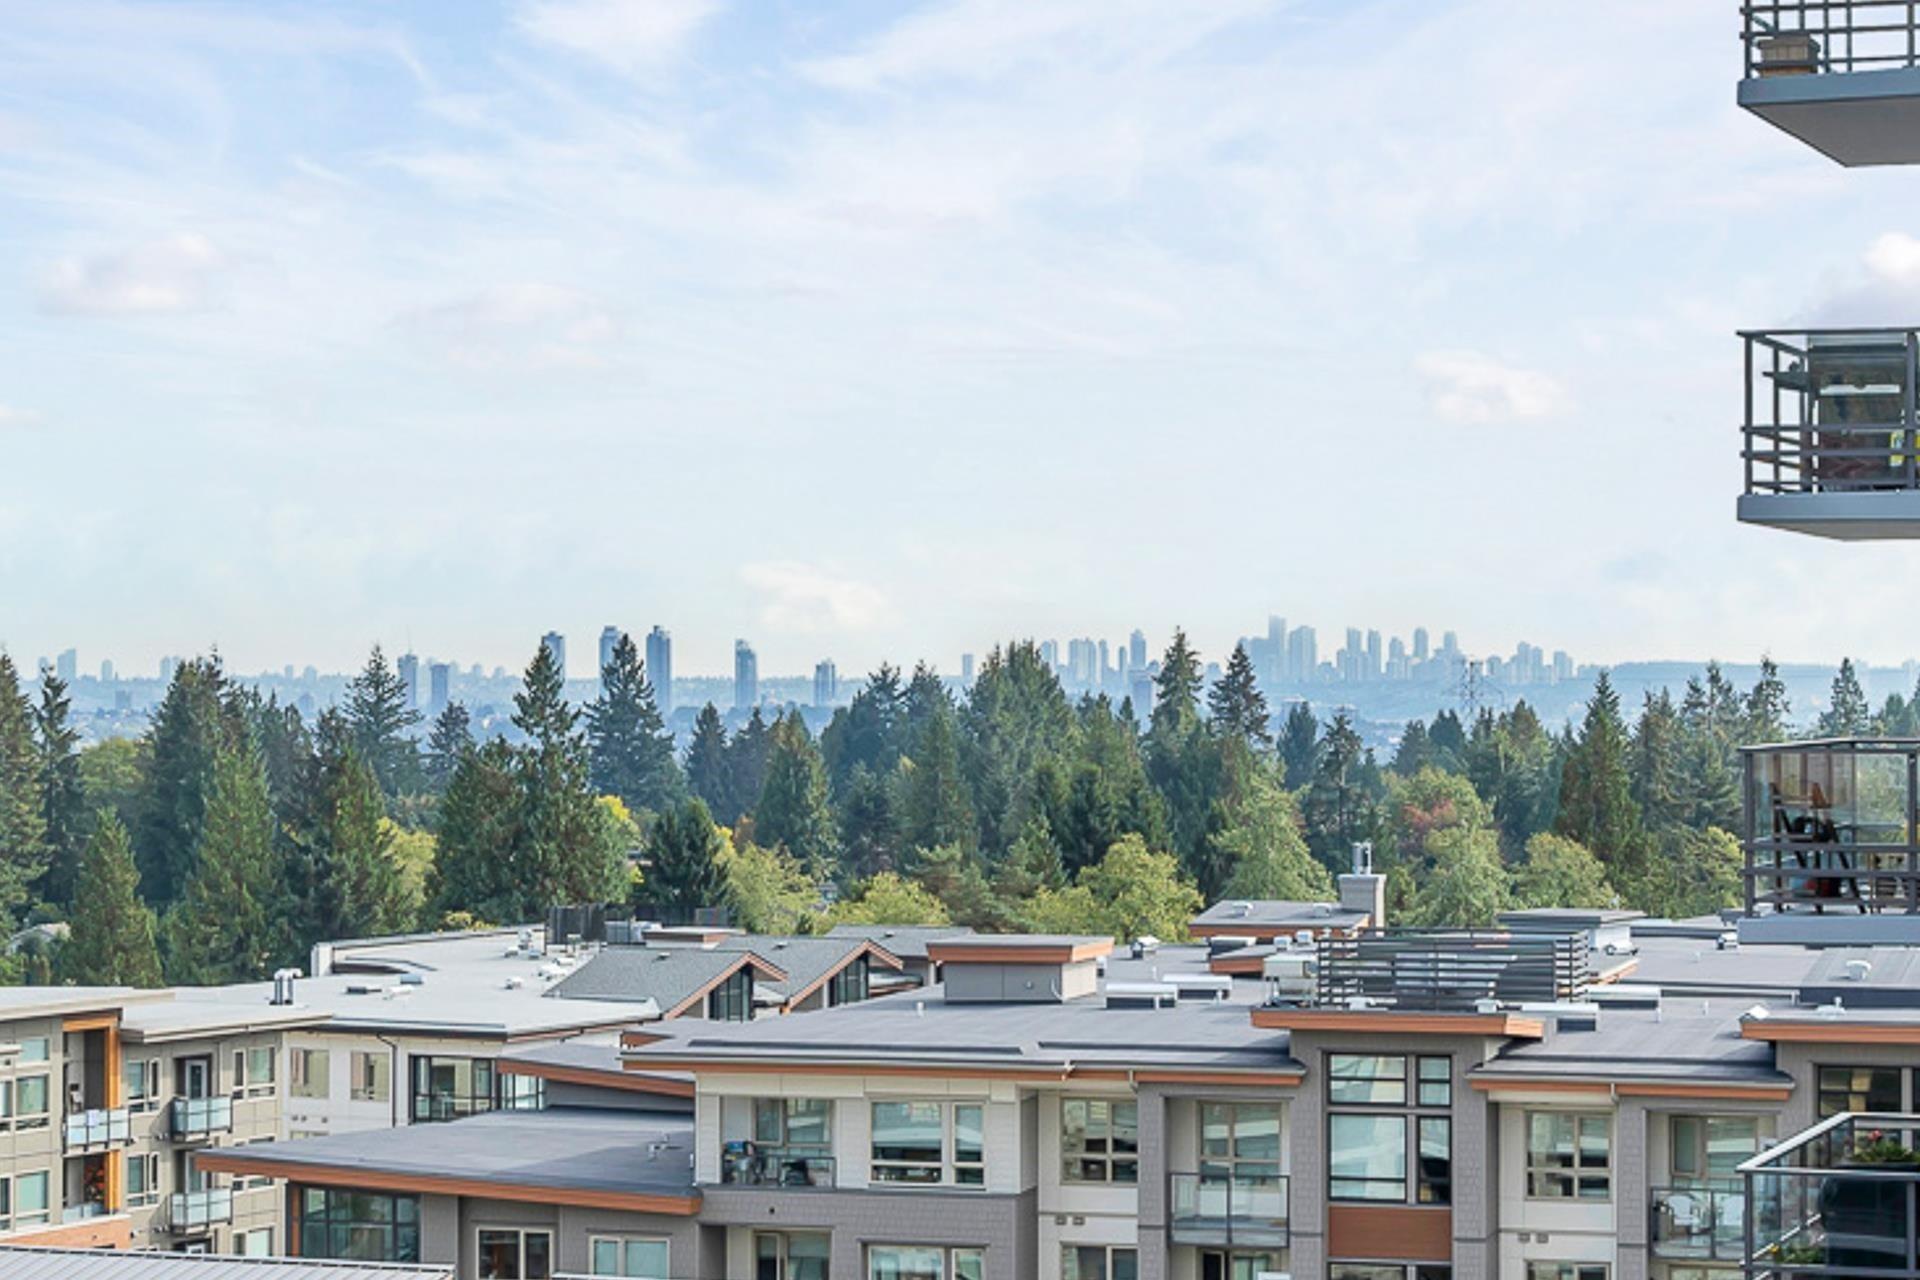 702 2780 VALLEY CENTRE AVENUE - Lynn Valley Apartment/Condo for sale, 3 Bedrooms (R2622279) - #27